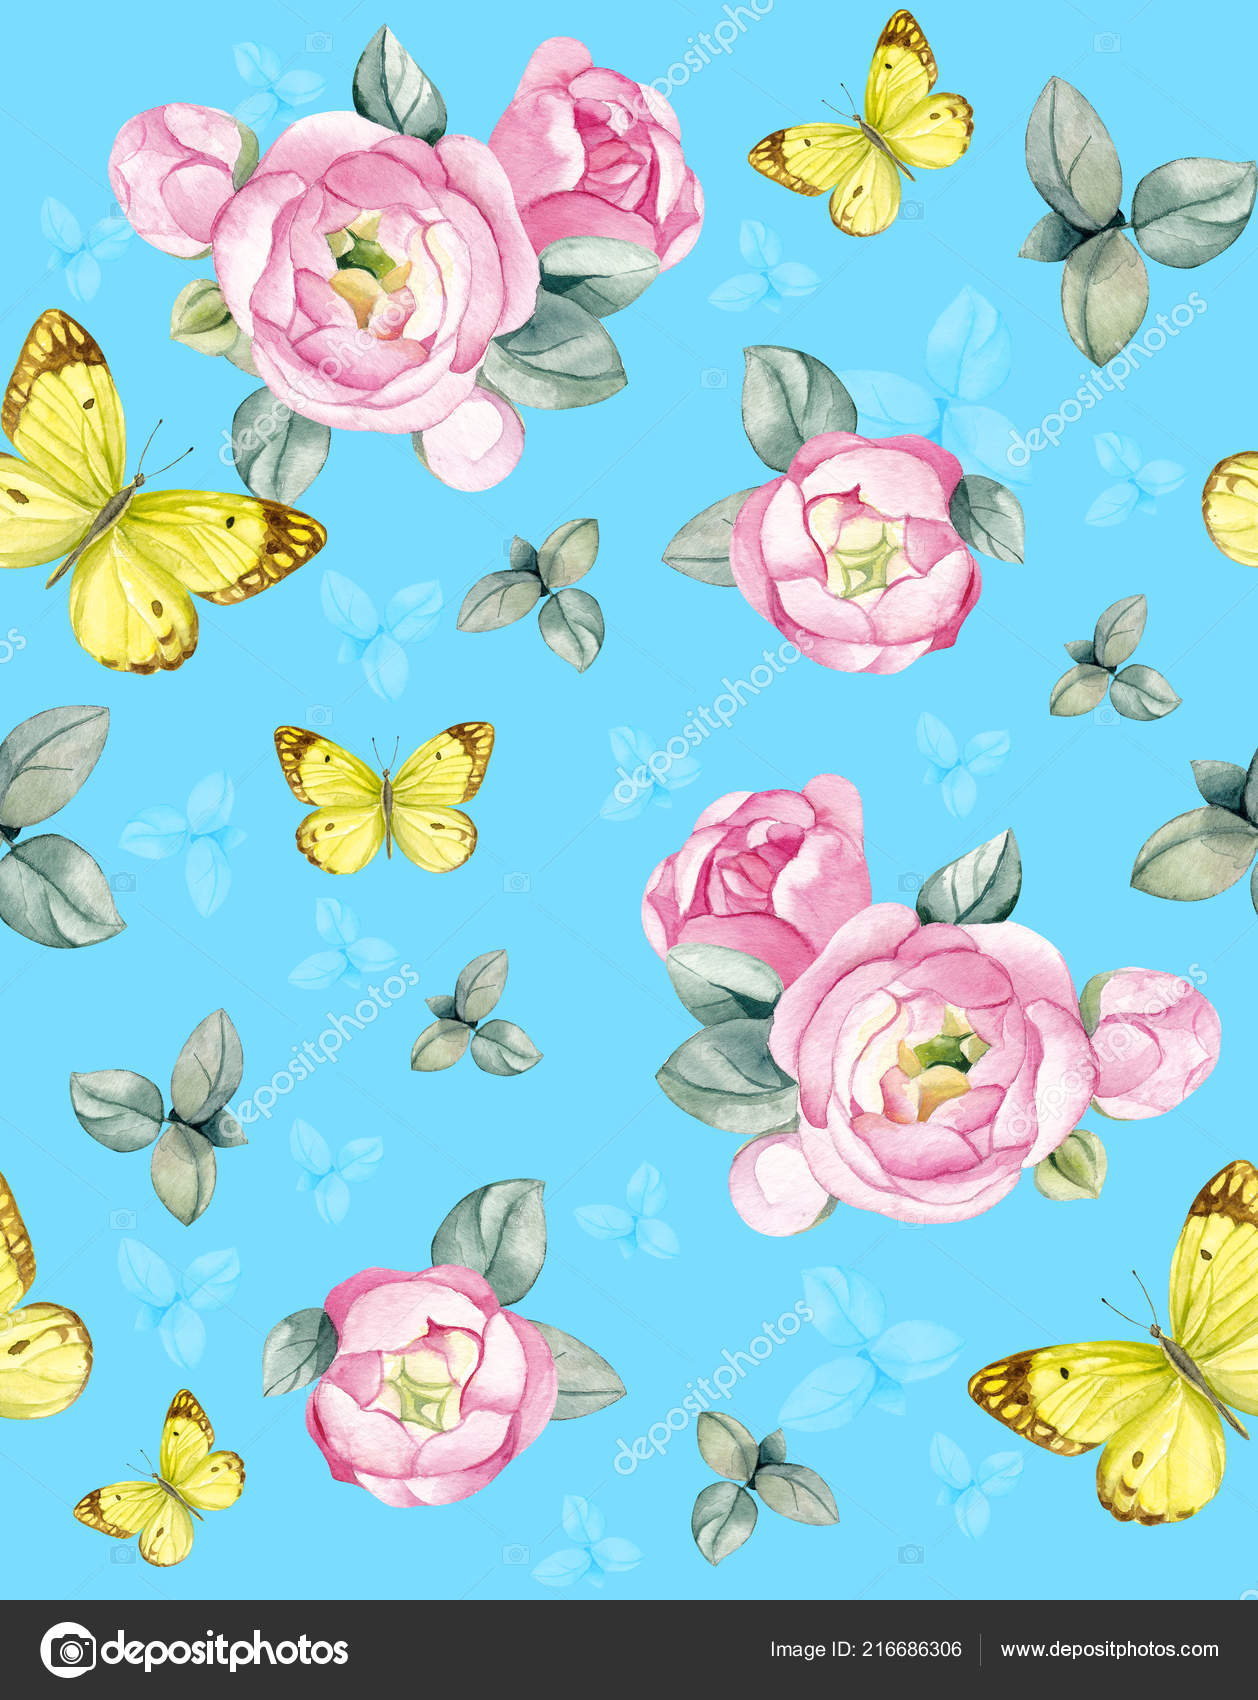 Flower Arrangement Pink Roses Butterfly Blue Background Suitable Invitations Business Stock Photo C Nezabudka Watercolor 216686306